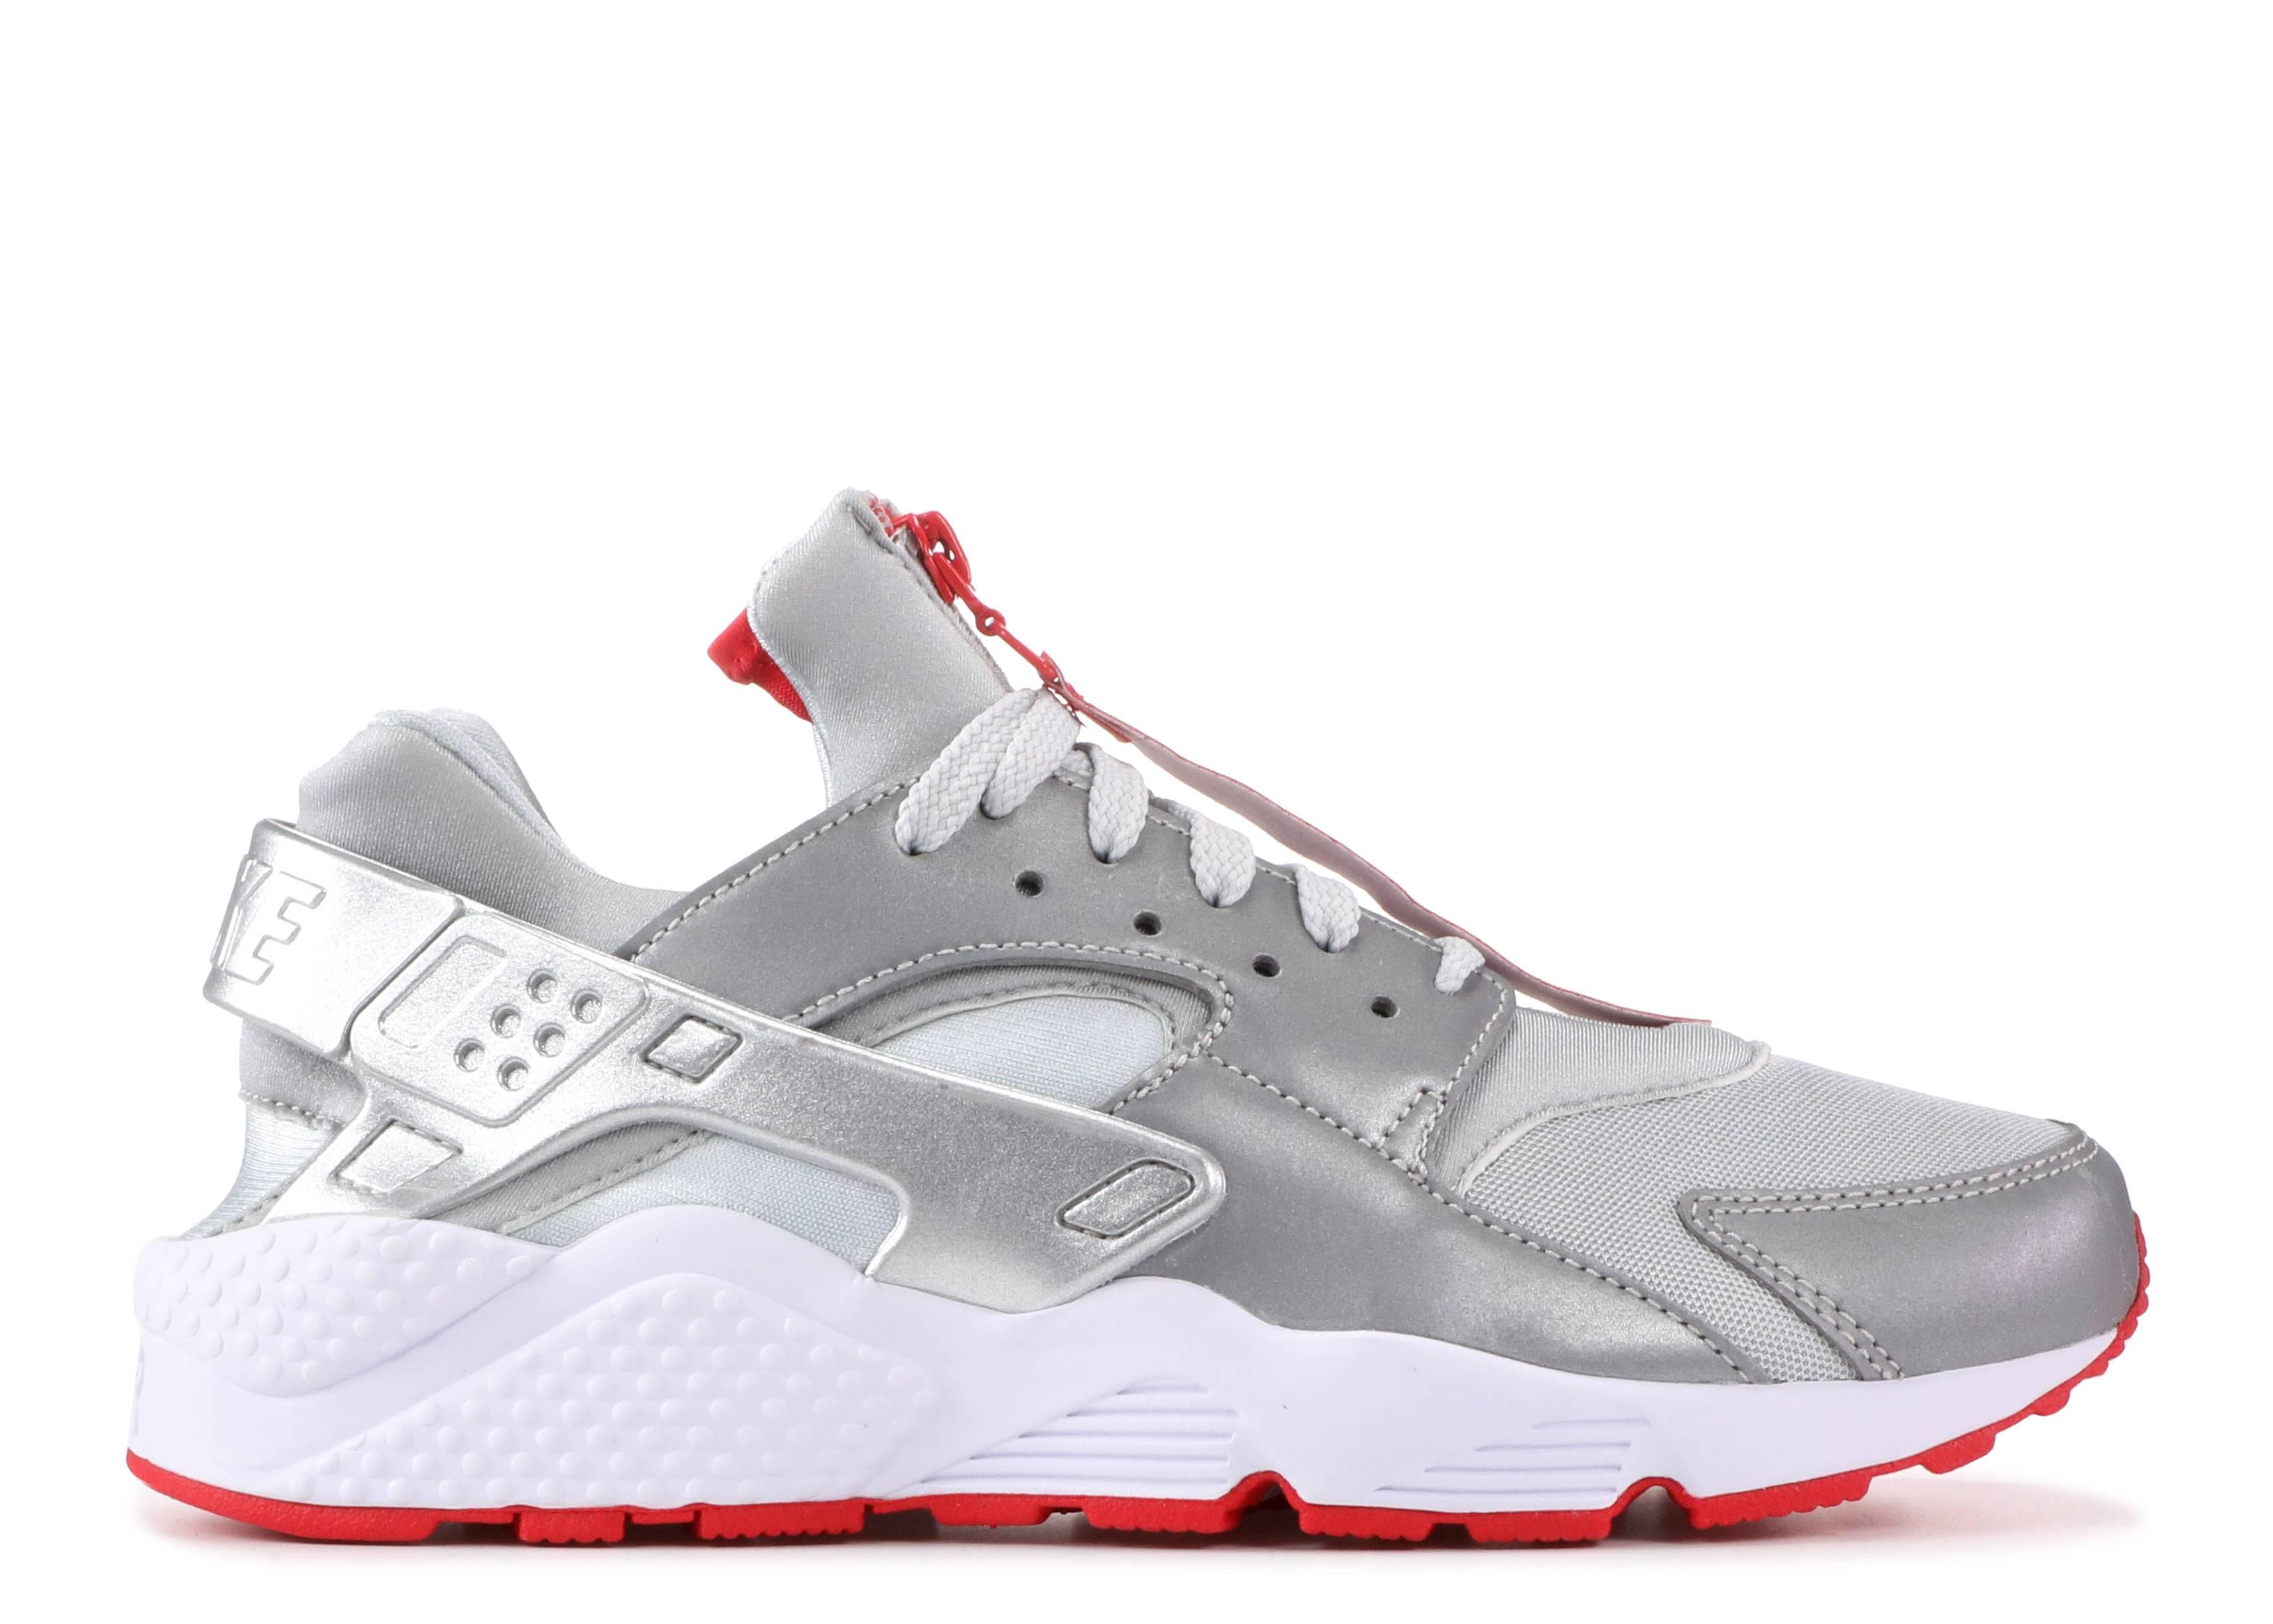 0e12eca46bfe3 Nike Air Huarache Run Zip QS